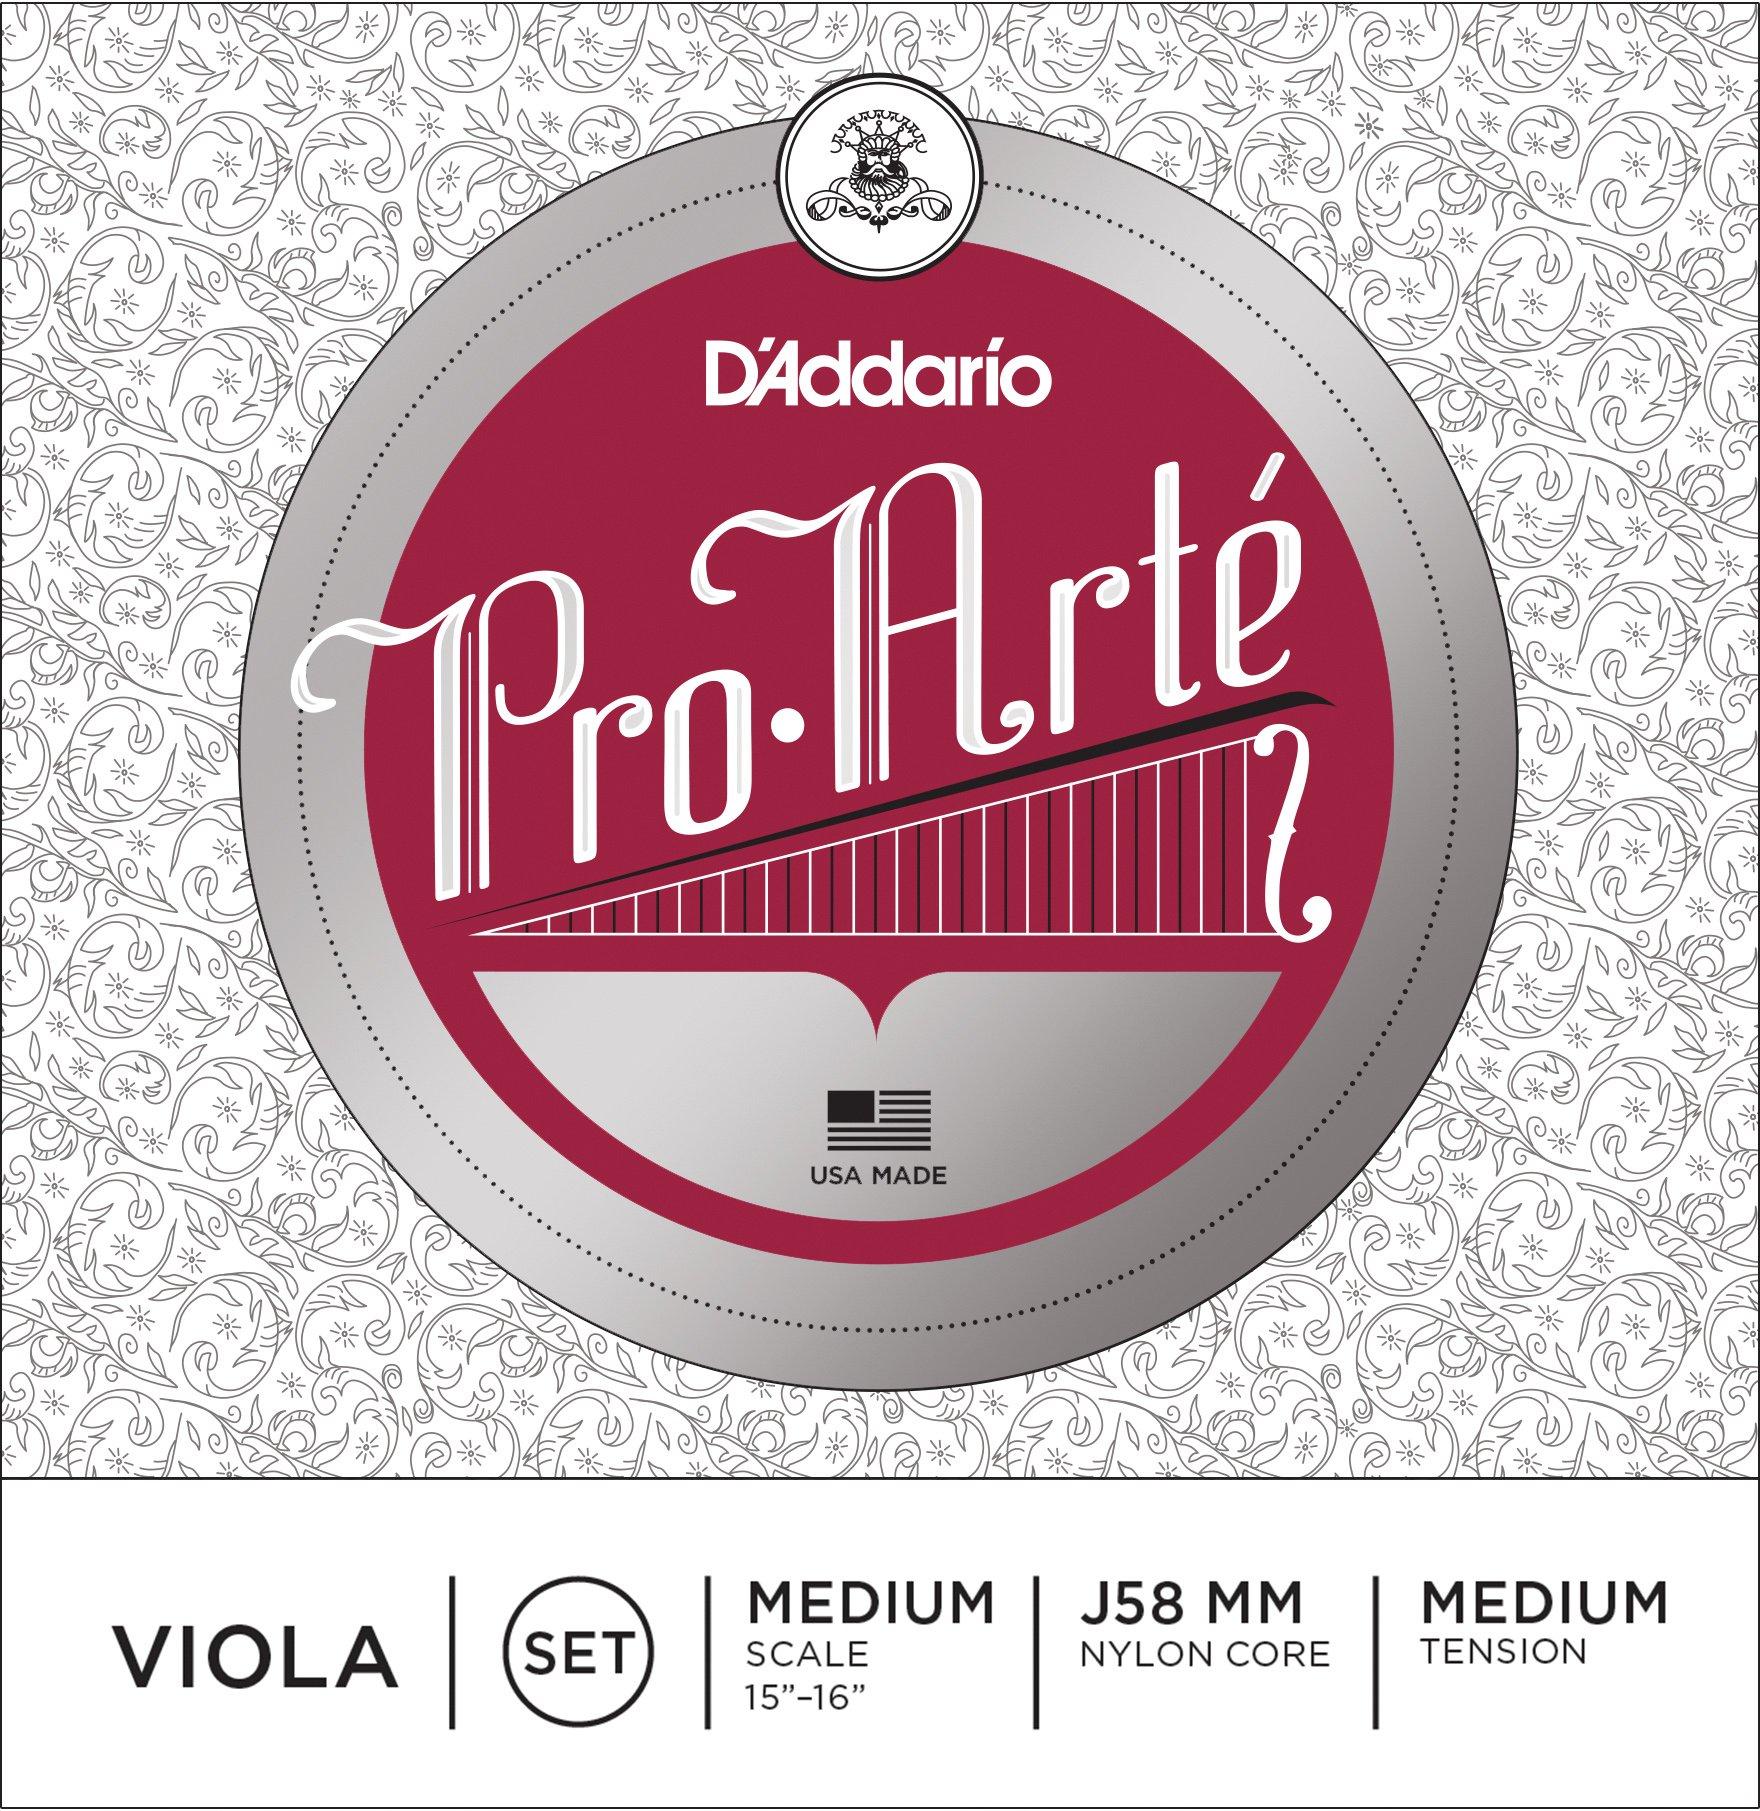 D'Addario Pro-Arte Viola String Set, Medium Scale, Medium Tension